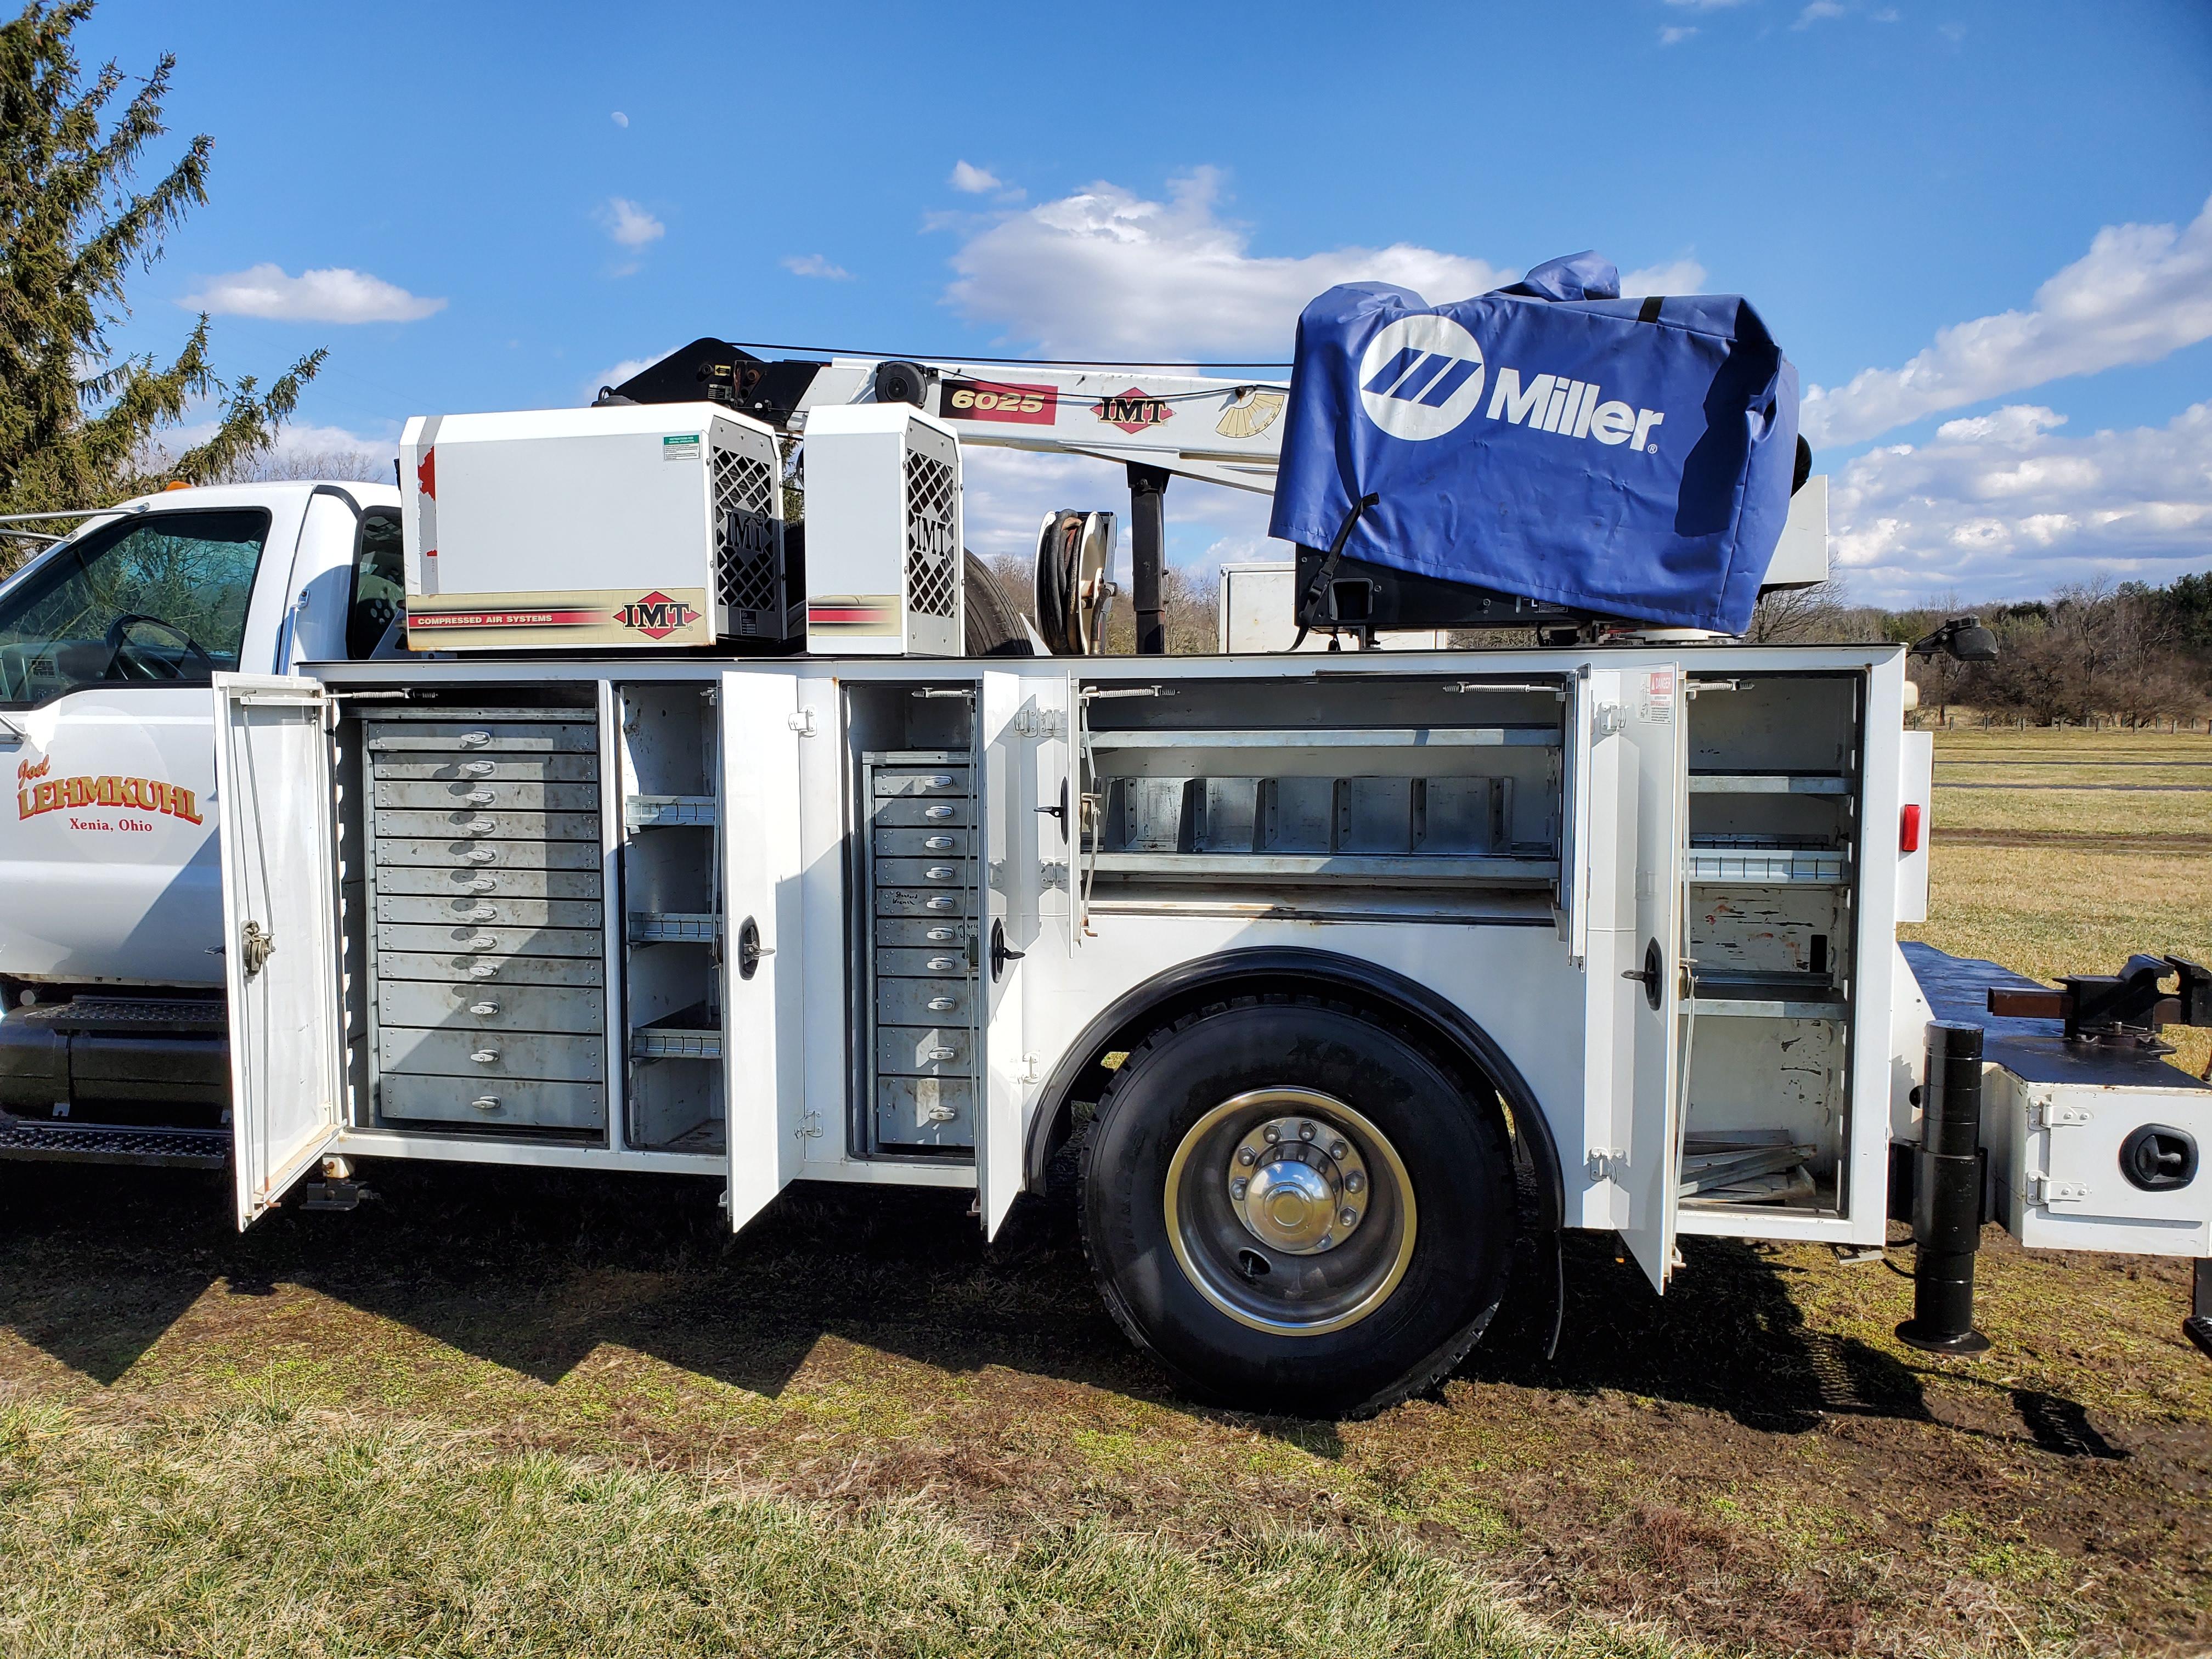 2007 Ford F750 Mechanic's Crane Truck, Cat C7 ACERT Diesel, Auto, 13 ft. IMF Dominator Body - Image 8 of 33